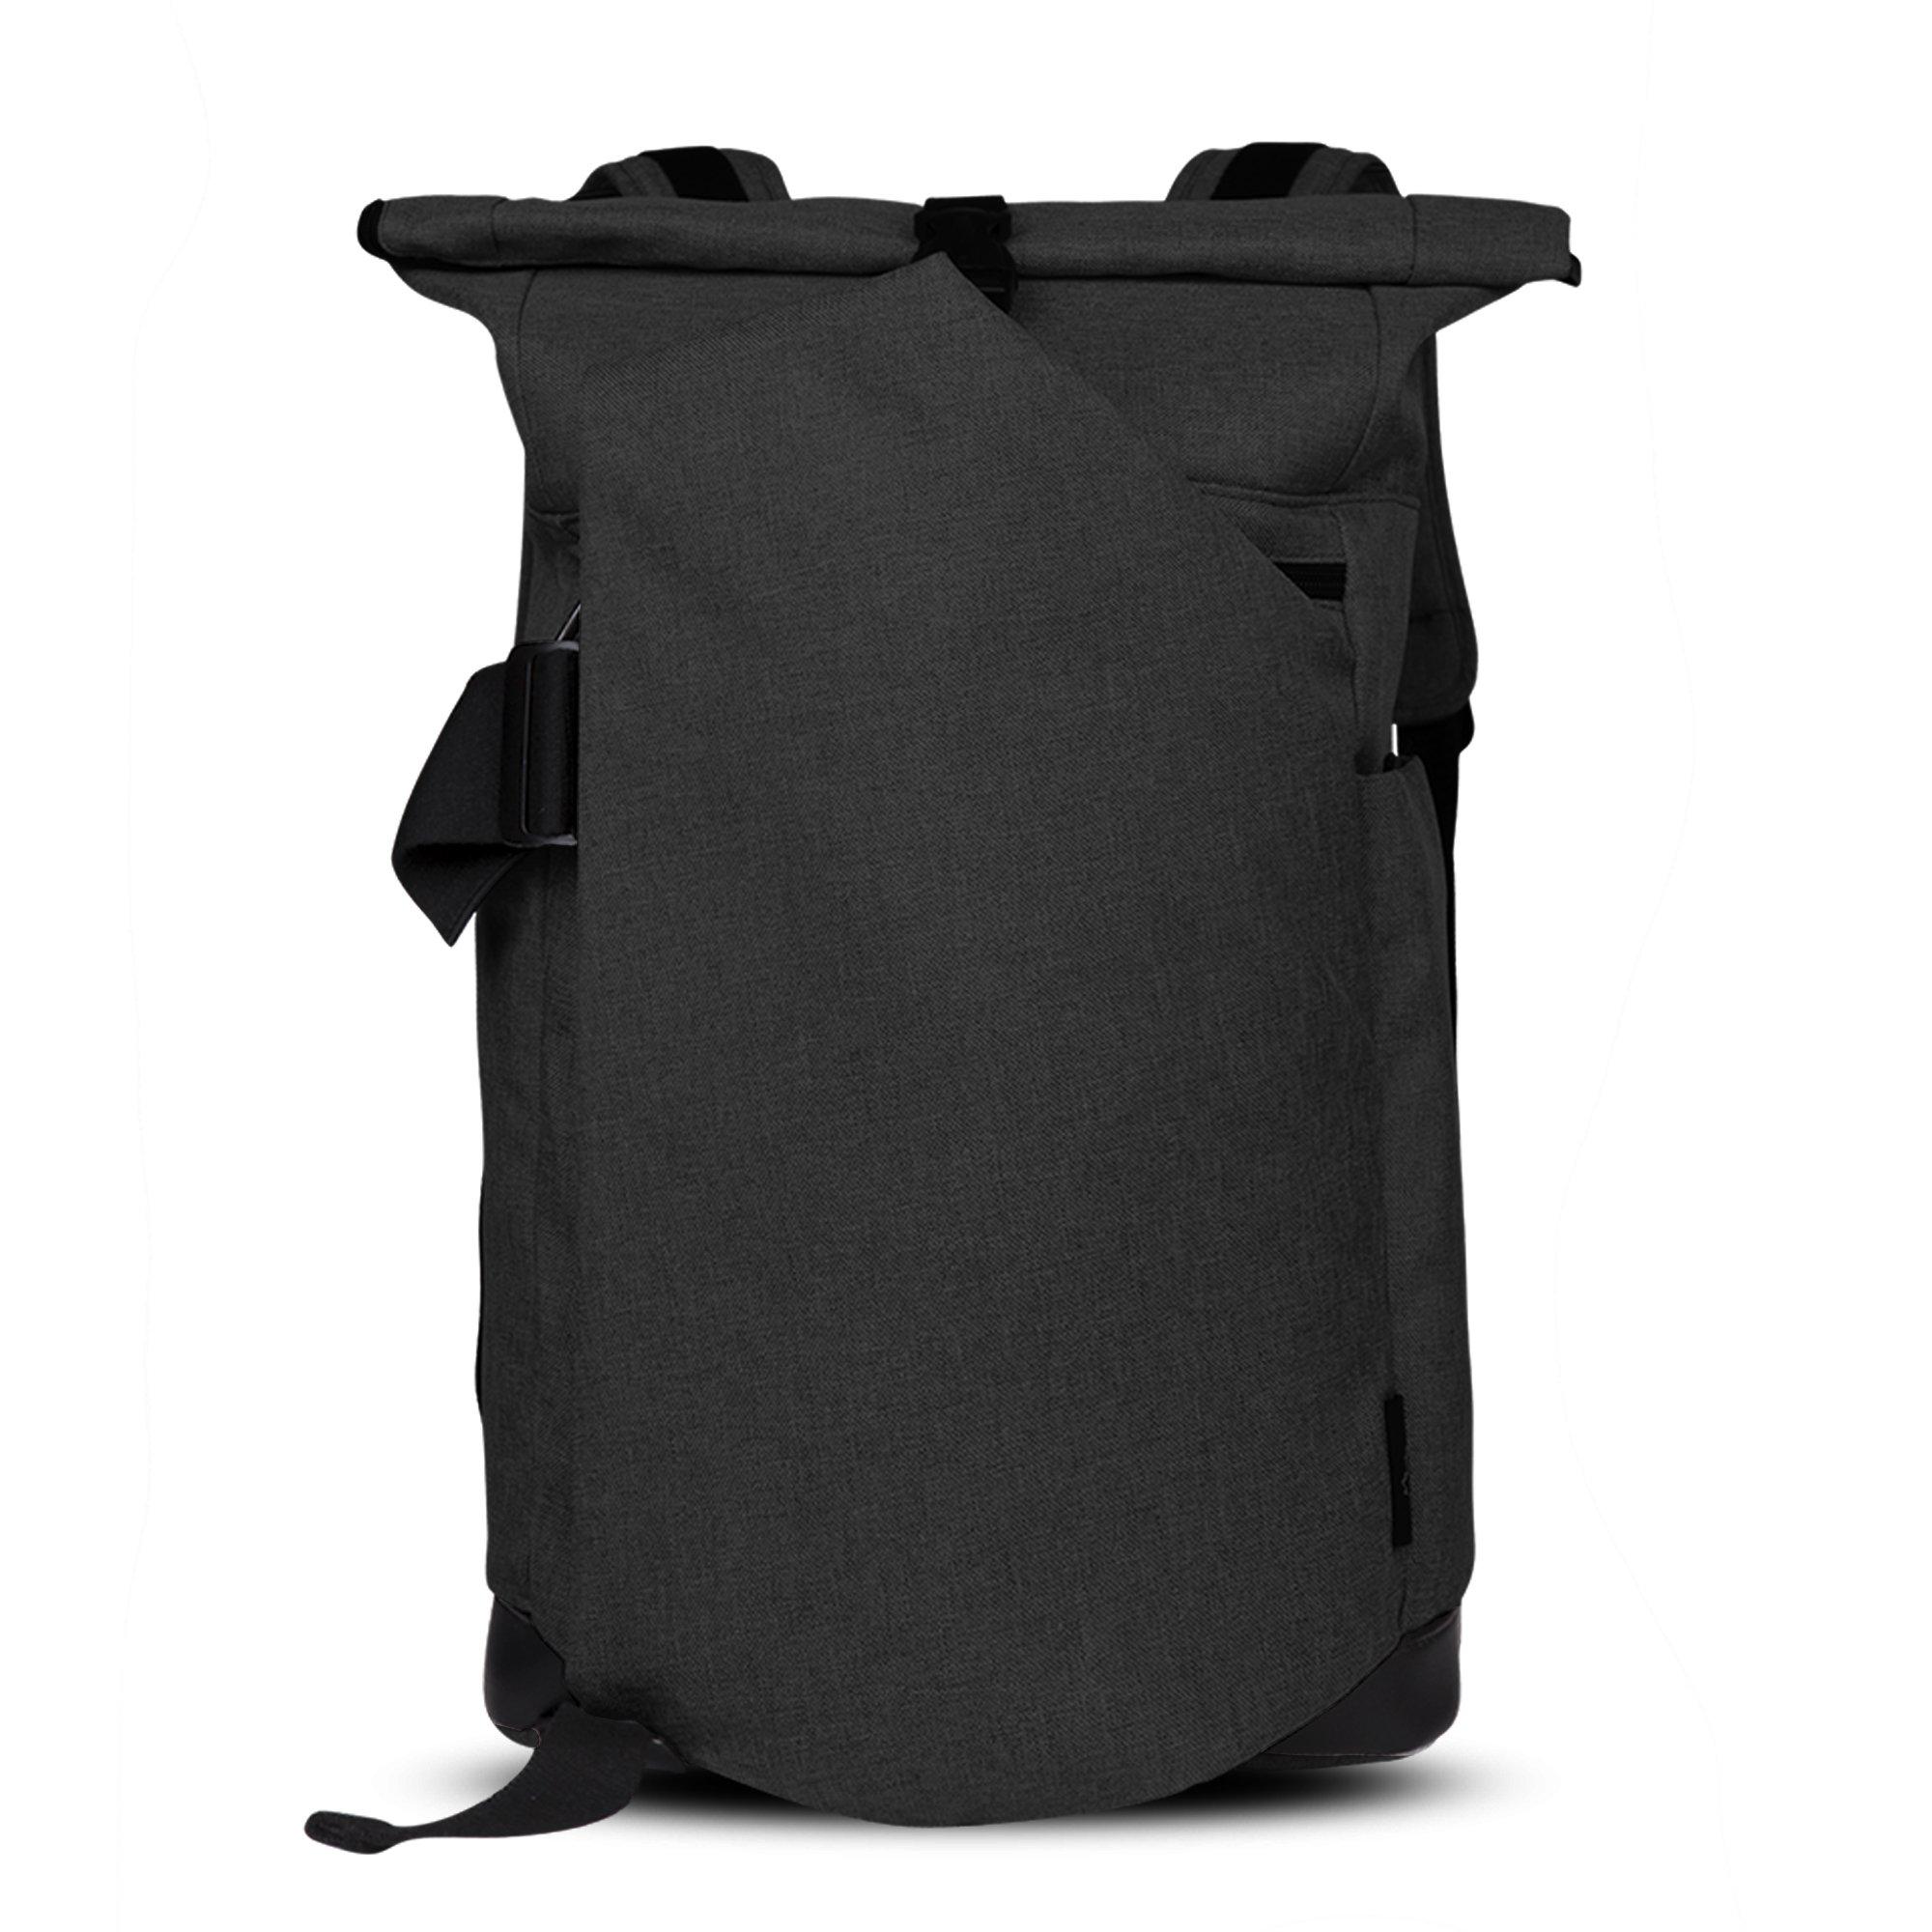 Cai 15.4 '' Business Laptop Backpack Anti-Theft Rolltop Bag Multifunctional Satchel Bag Water Resistant Computer Rucksack School Working Travel Commuting Bag for Men Women 5196 Ash Black